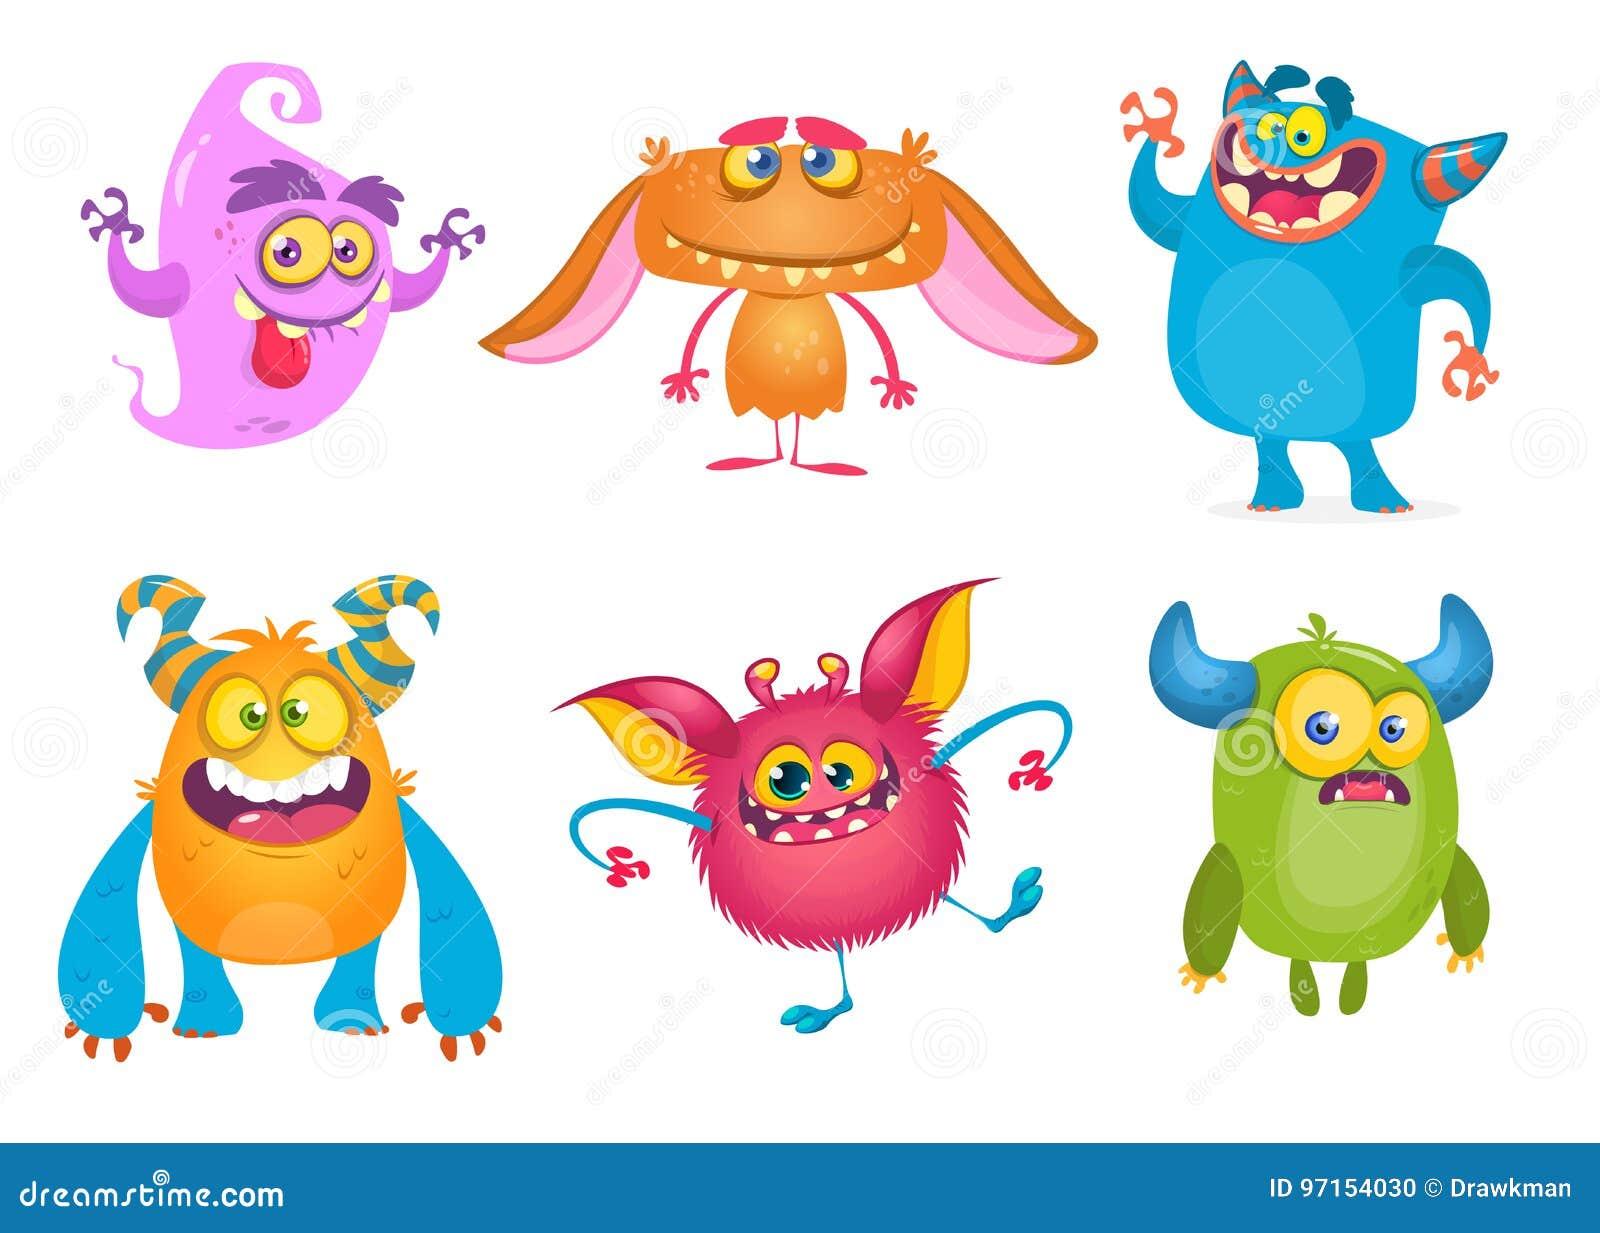 Nette Karikaturmonster Vektorsatz Karikaturmonster: Geist, Kobold, Bigfoot-Yeti, Schleppangel und Ausländer Halloween-Charaktere